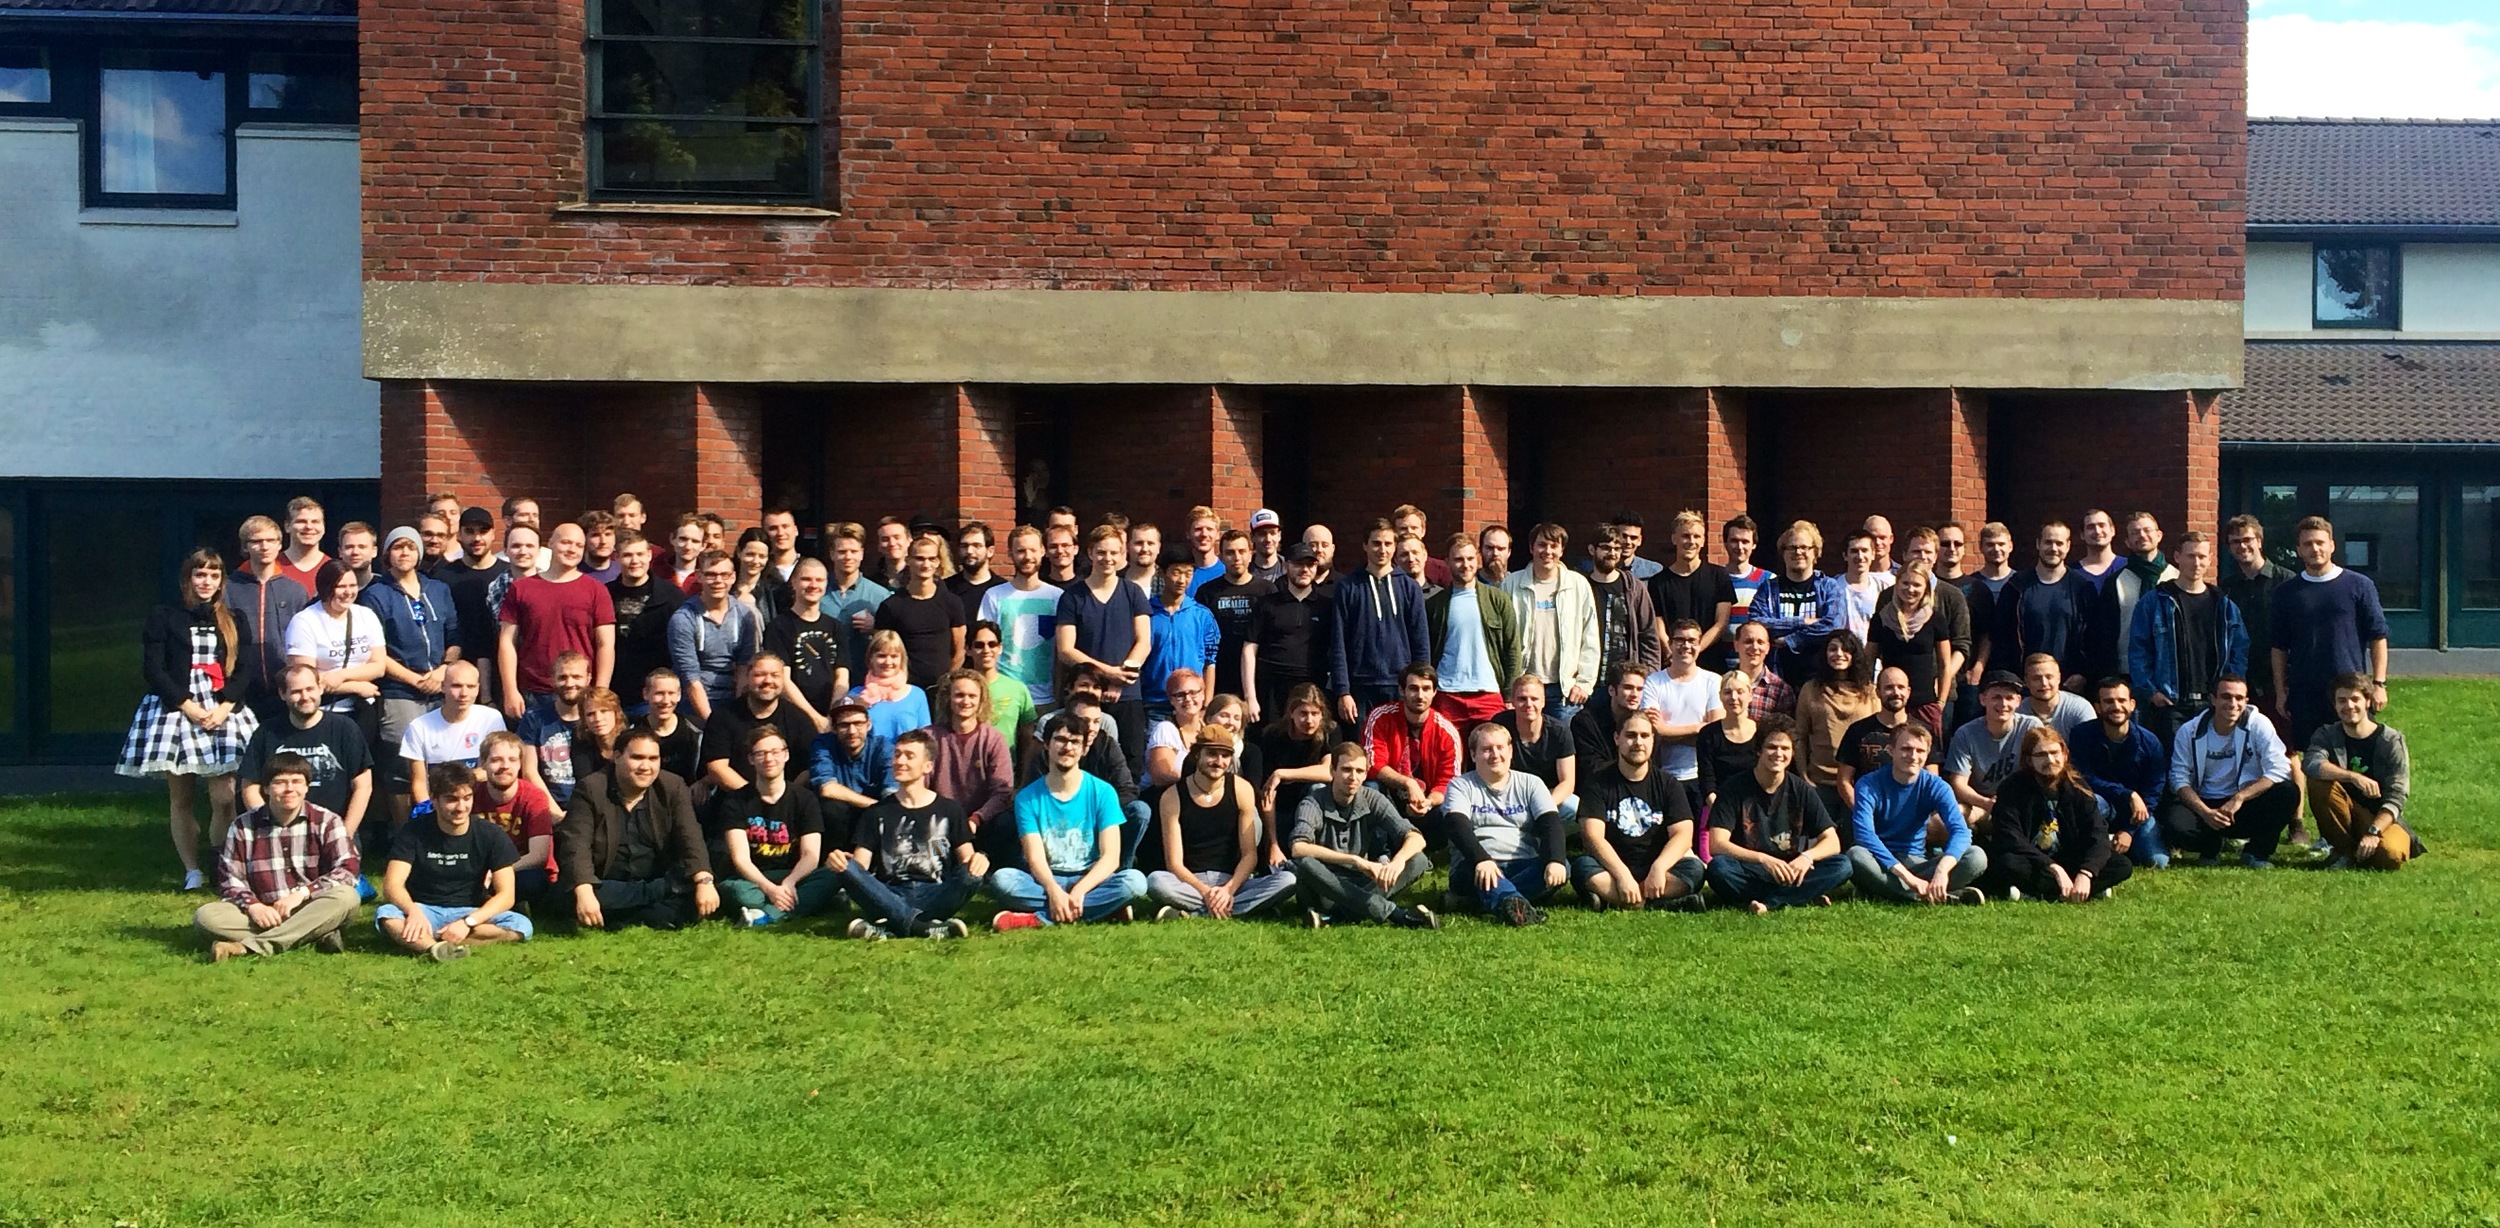 The 115 new DADIU students